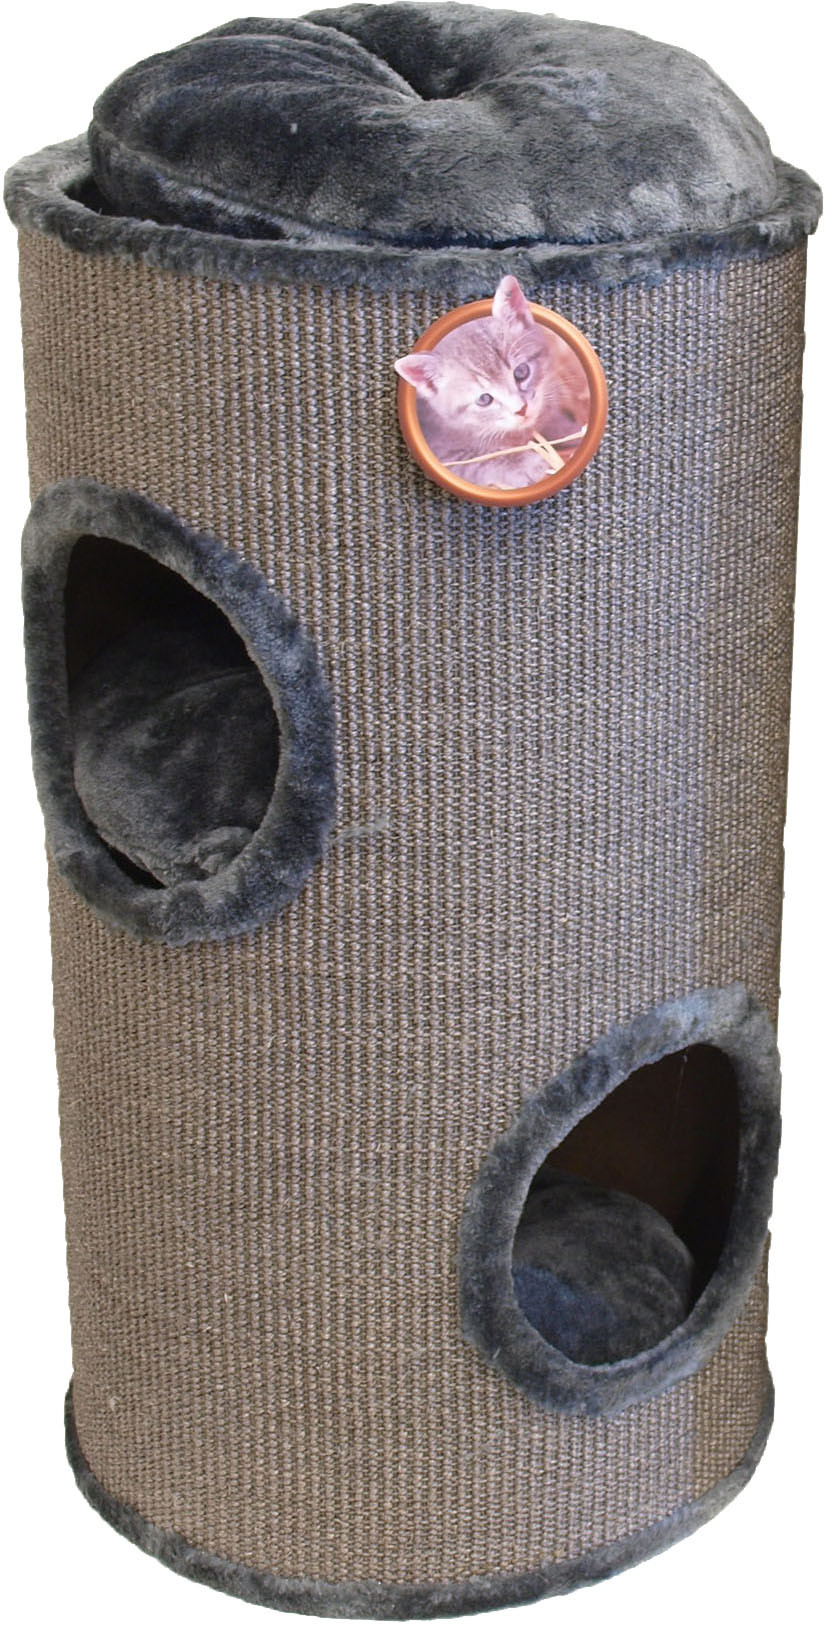 Krabton sisal 2-gaats grijs 75 cm